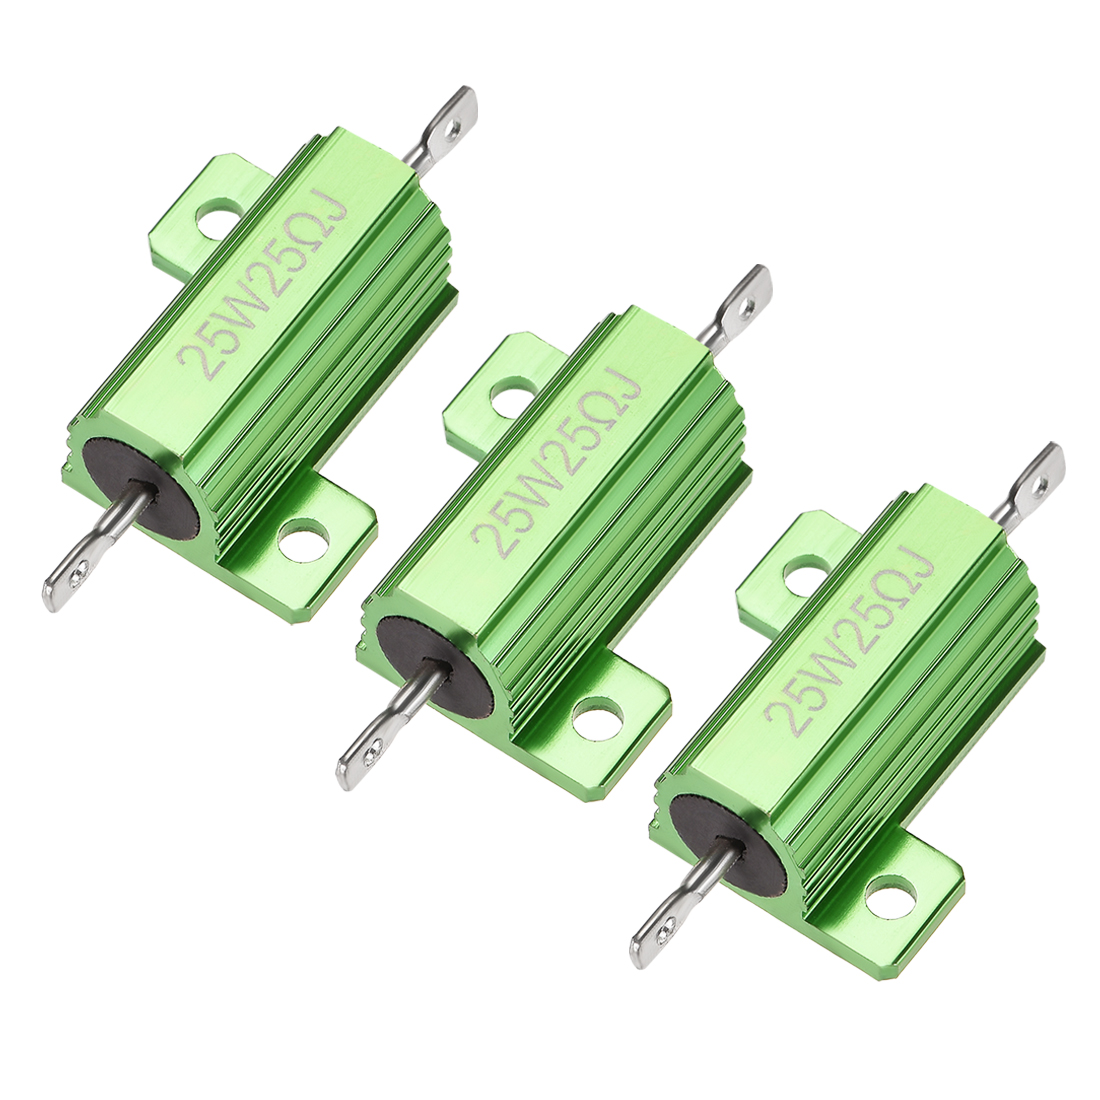 25W 25 Ohm 5% Aluminum Housing Resistor Wirewound Resistor Green Tone 3 Pcs